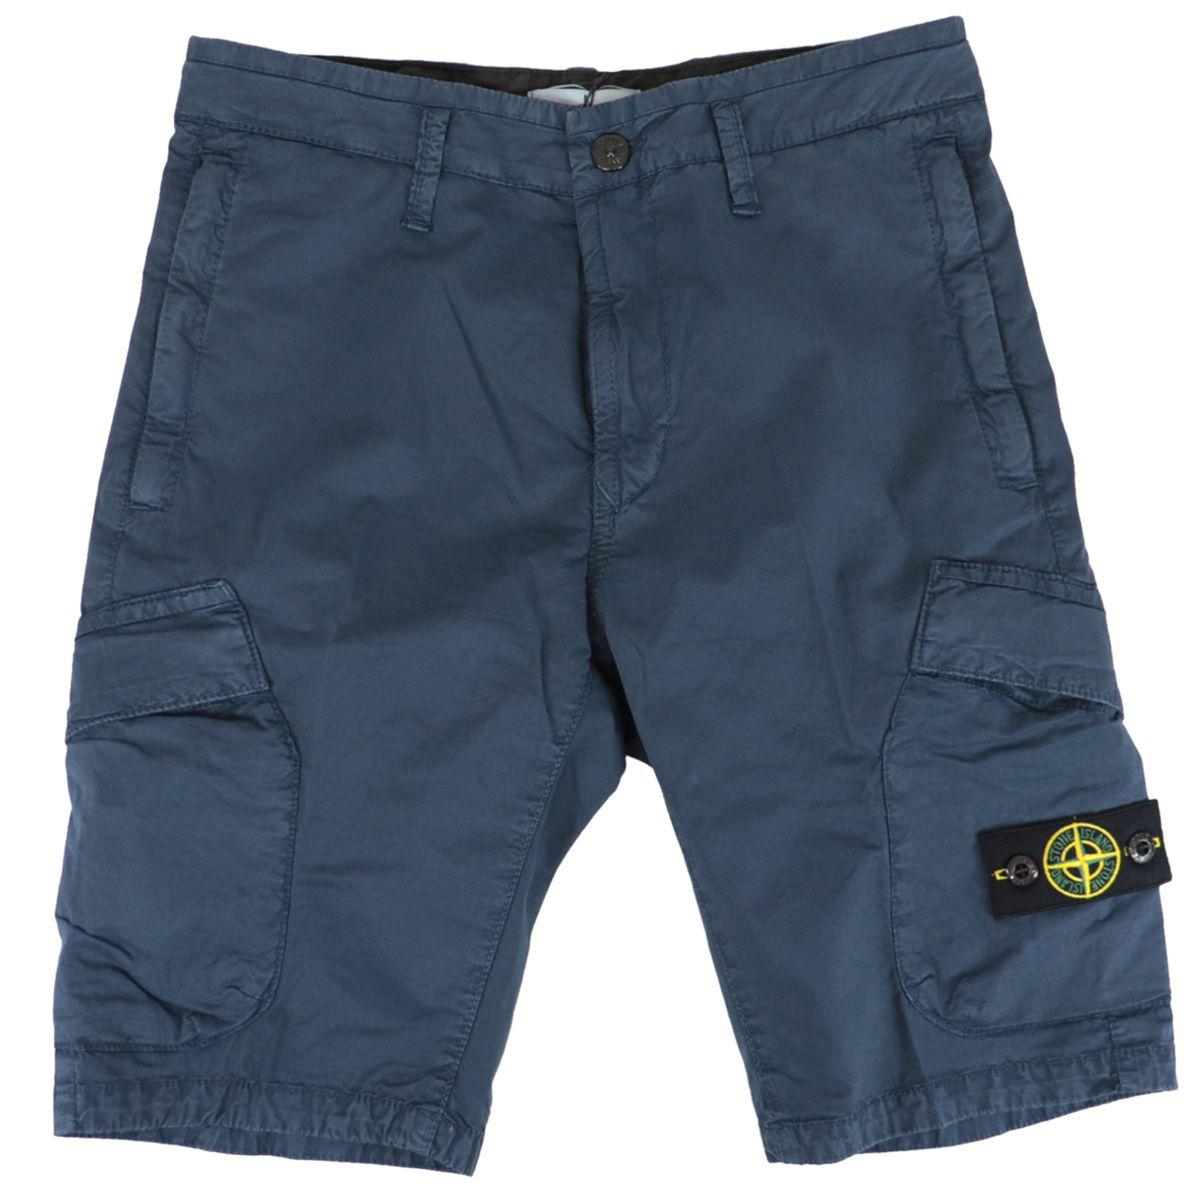 Soft stretch cotton bermuda with pockets Blue STONE ISLAND JUNIOR